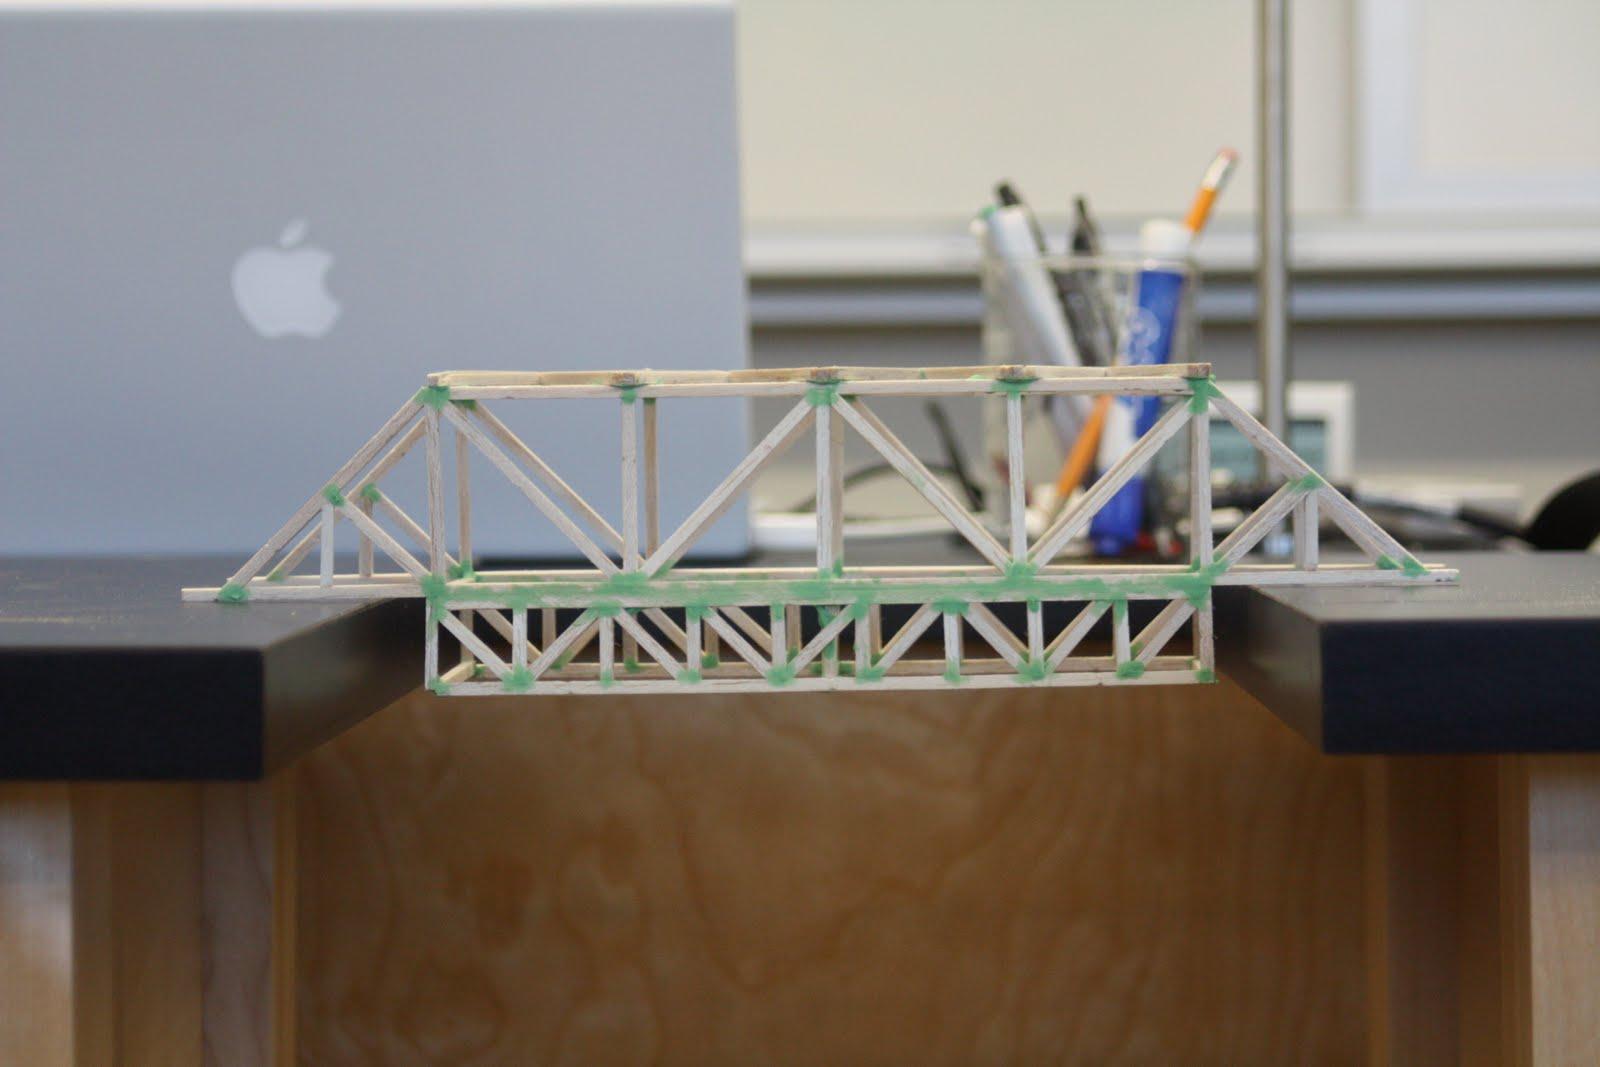 Pratt Truss Toothpick Bridge Suspension Toothpick B...